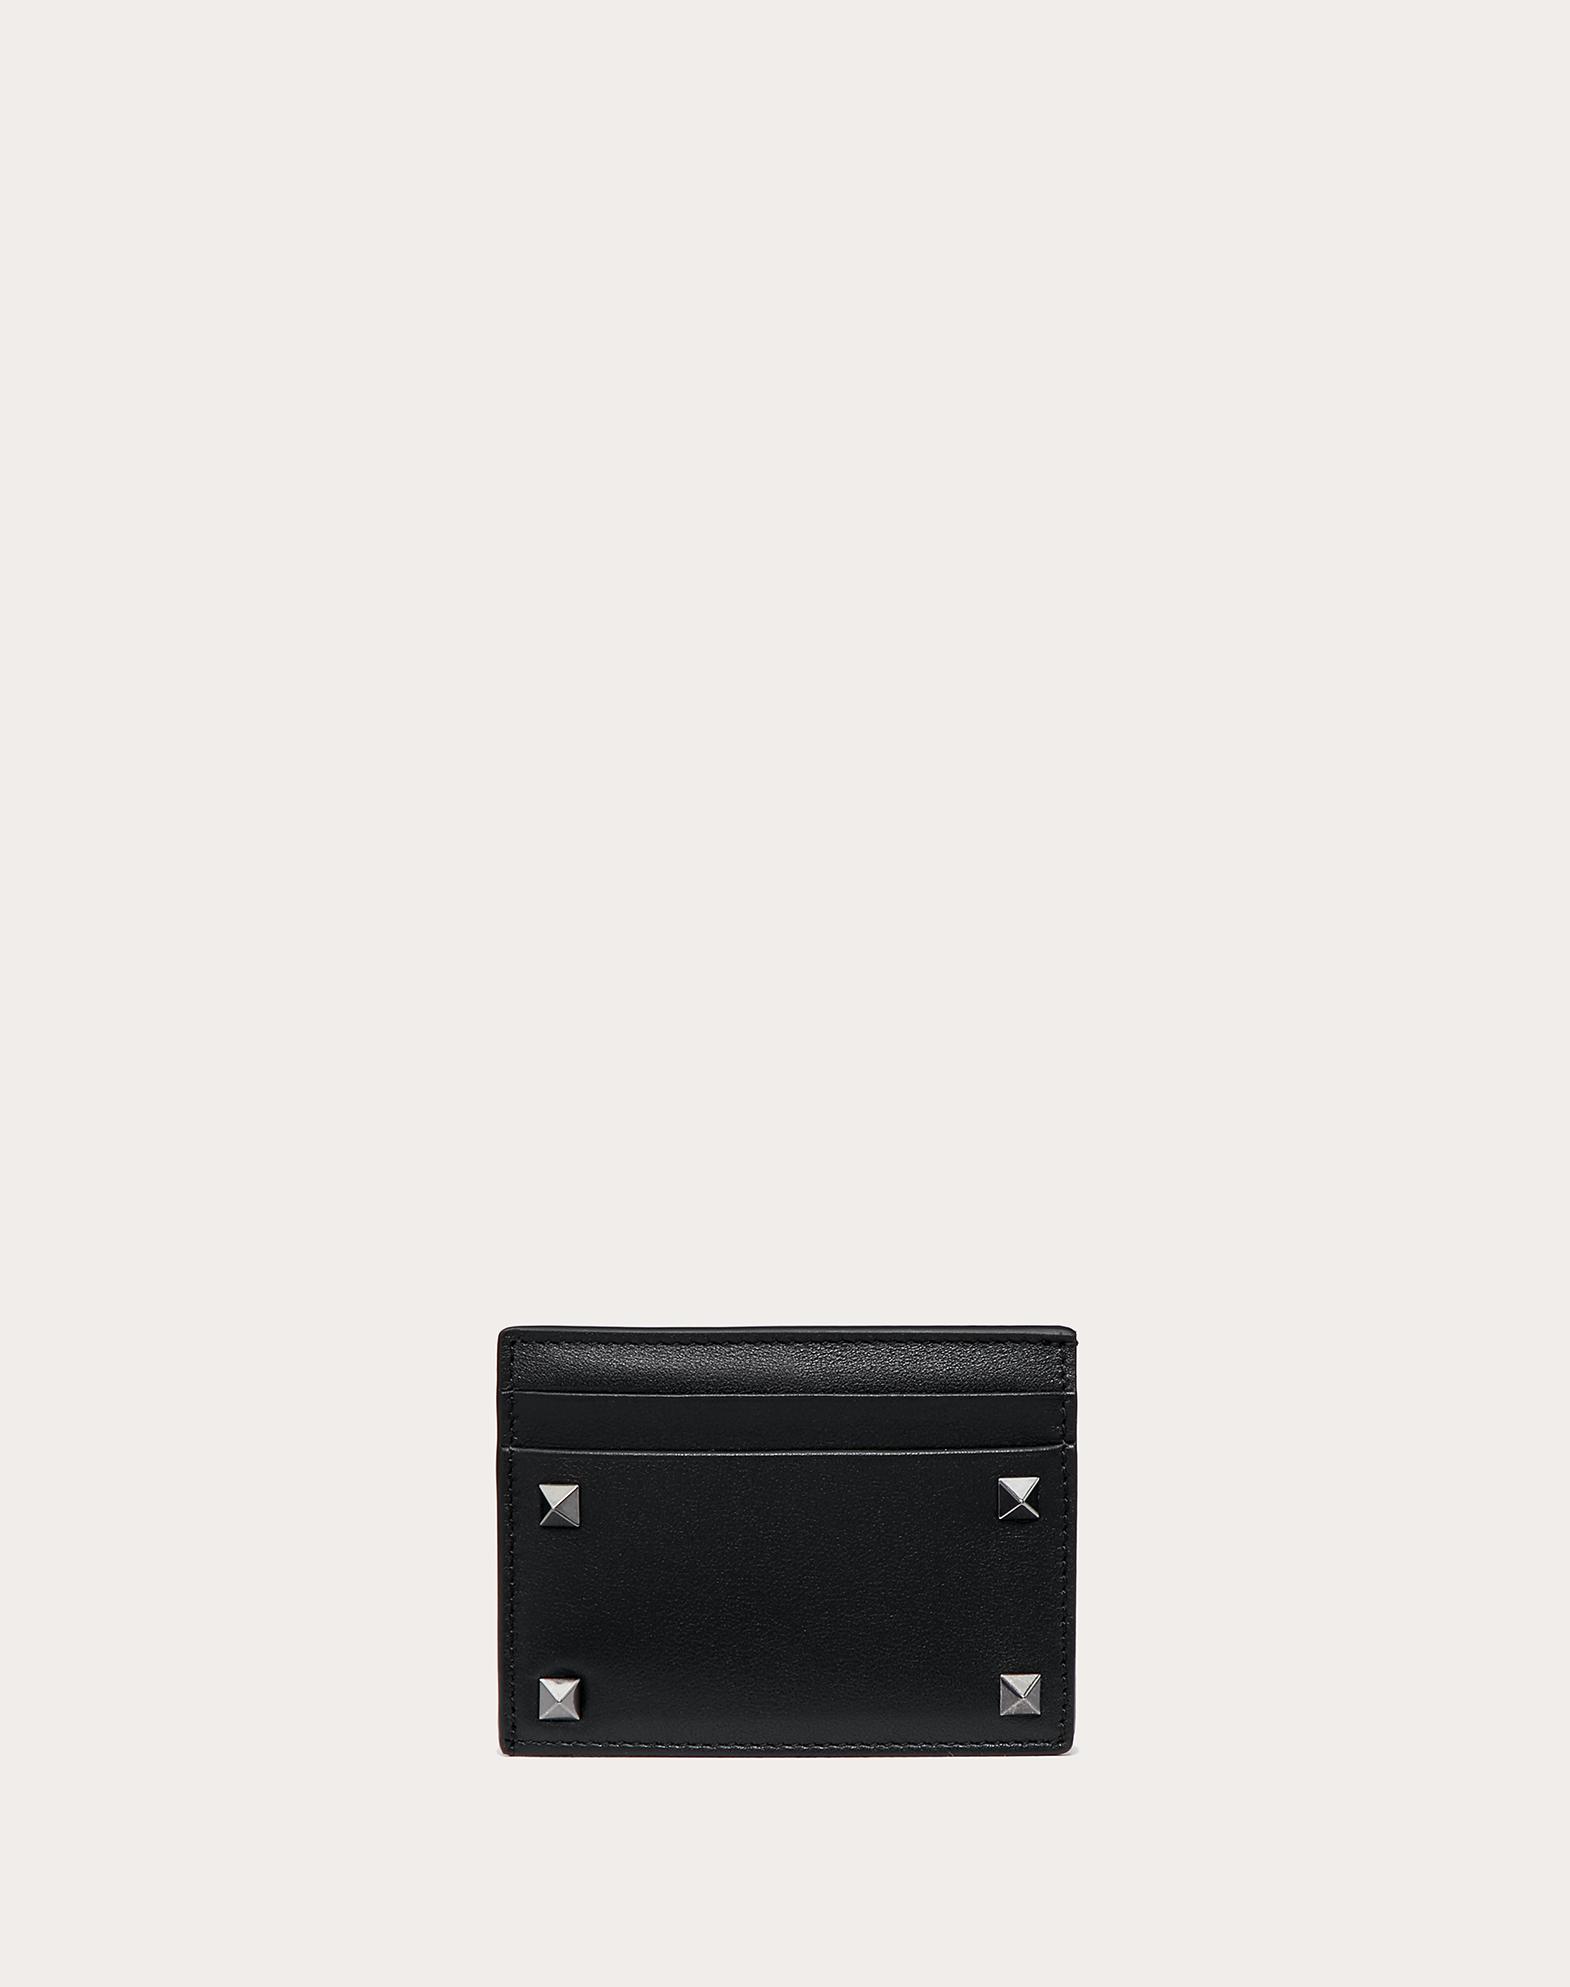 Rockstud card holder